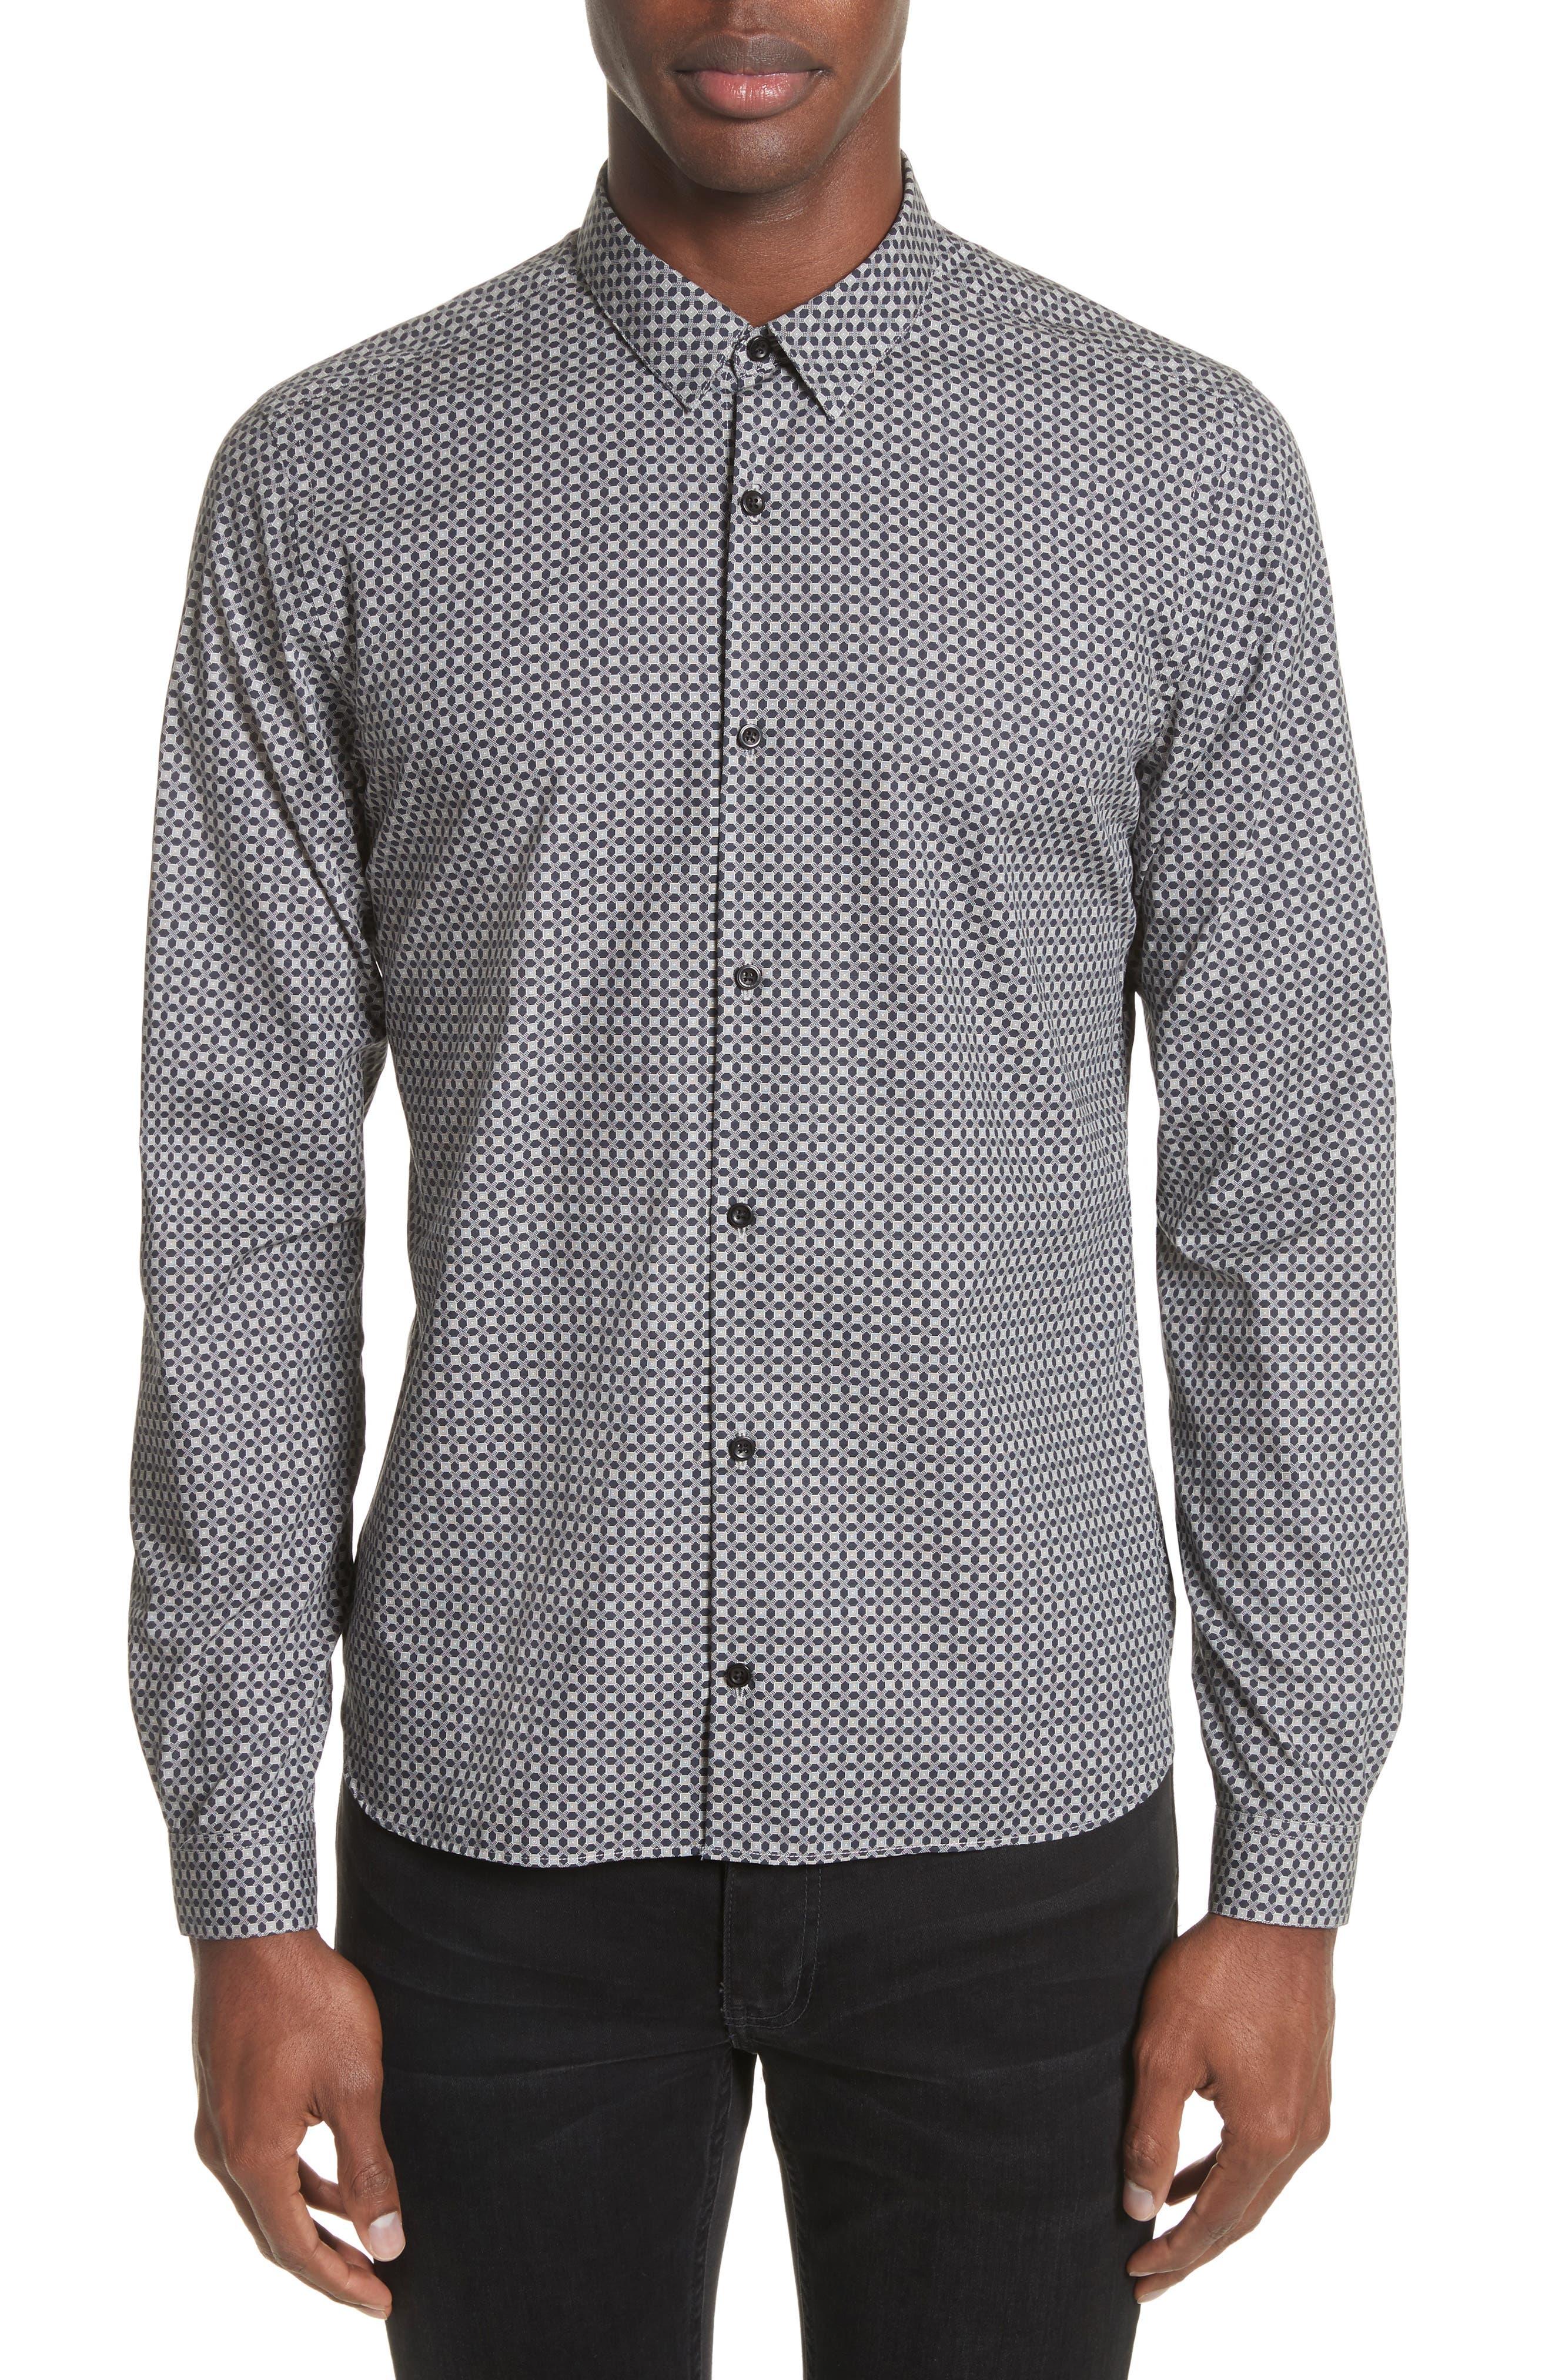 Main Image - The Kooples Geometric Print Woven Shirt